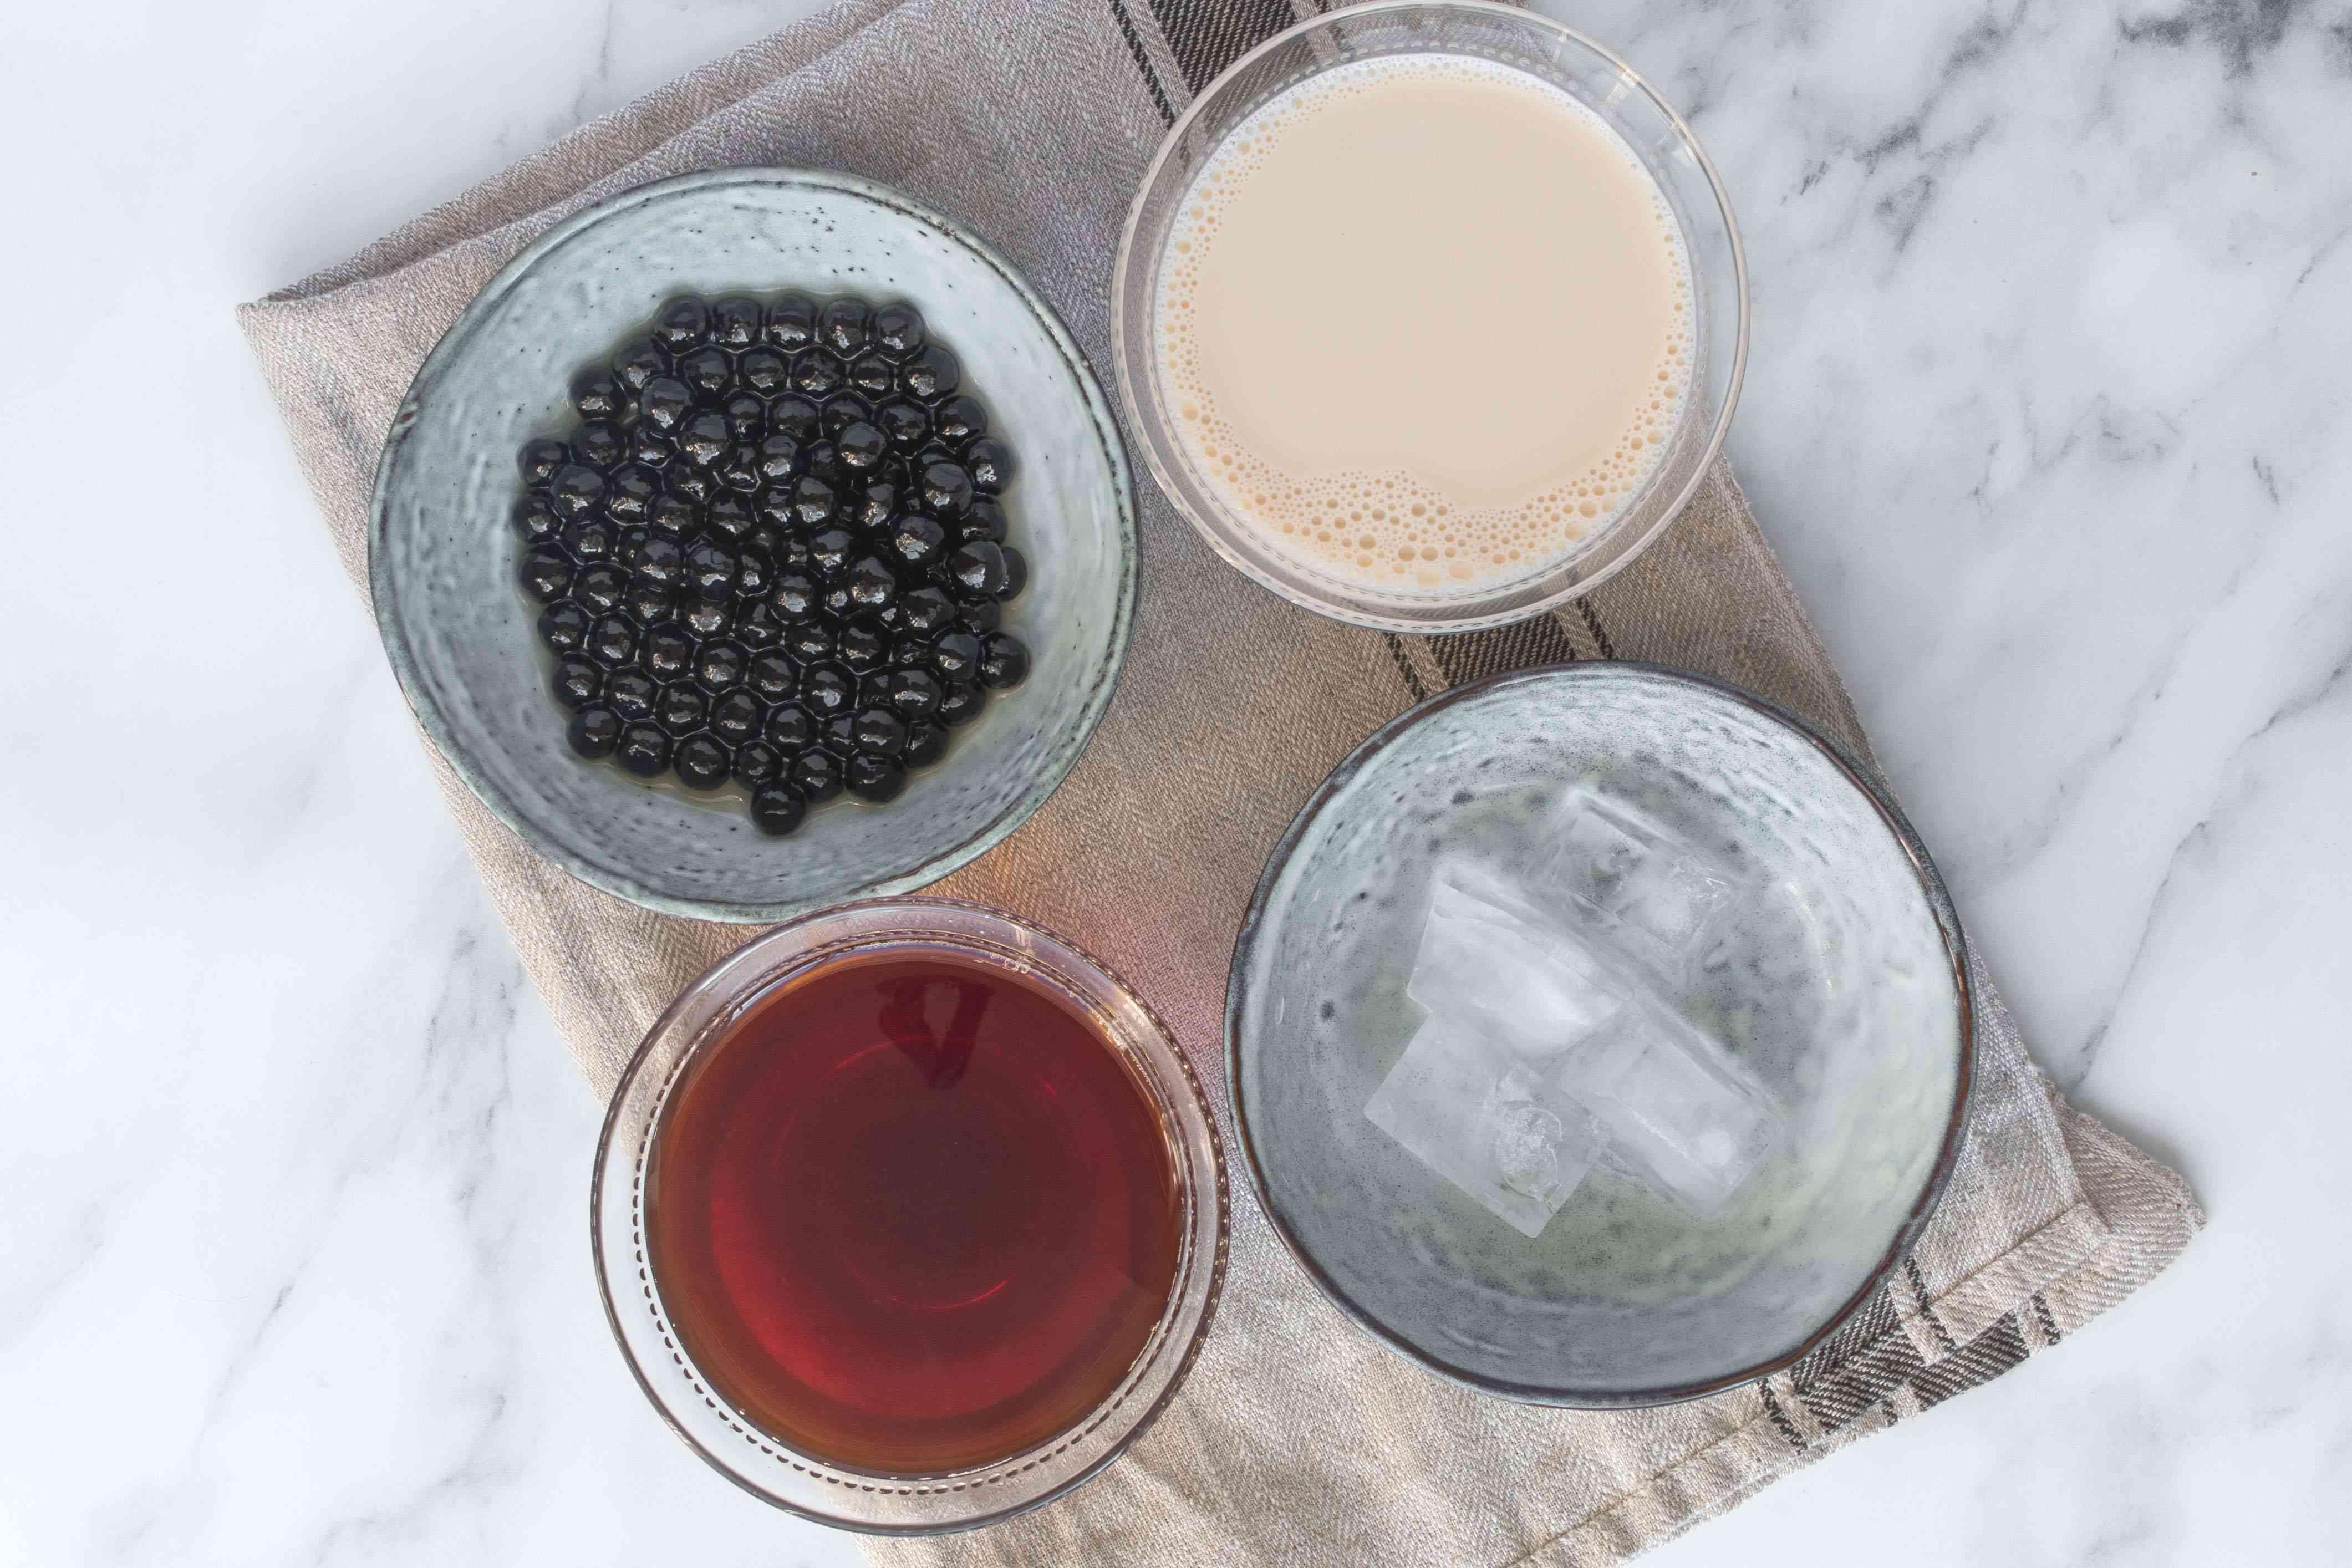 Ingredients for bubble tea